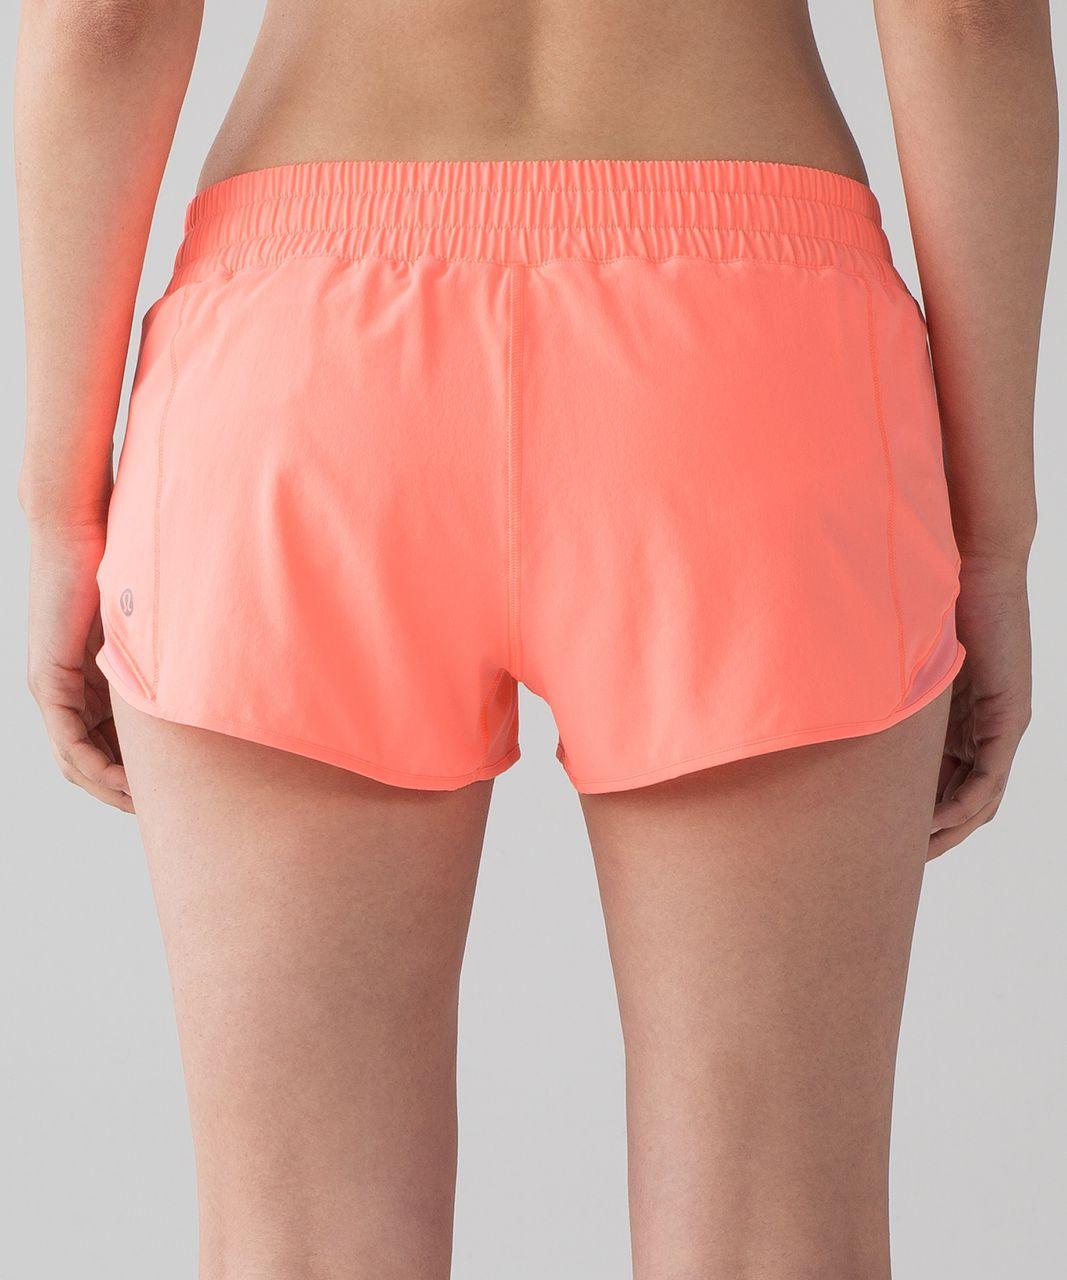 "Lululemon Hotty Hot Short II (2.5"") - Pop Orange"